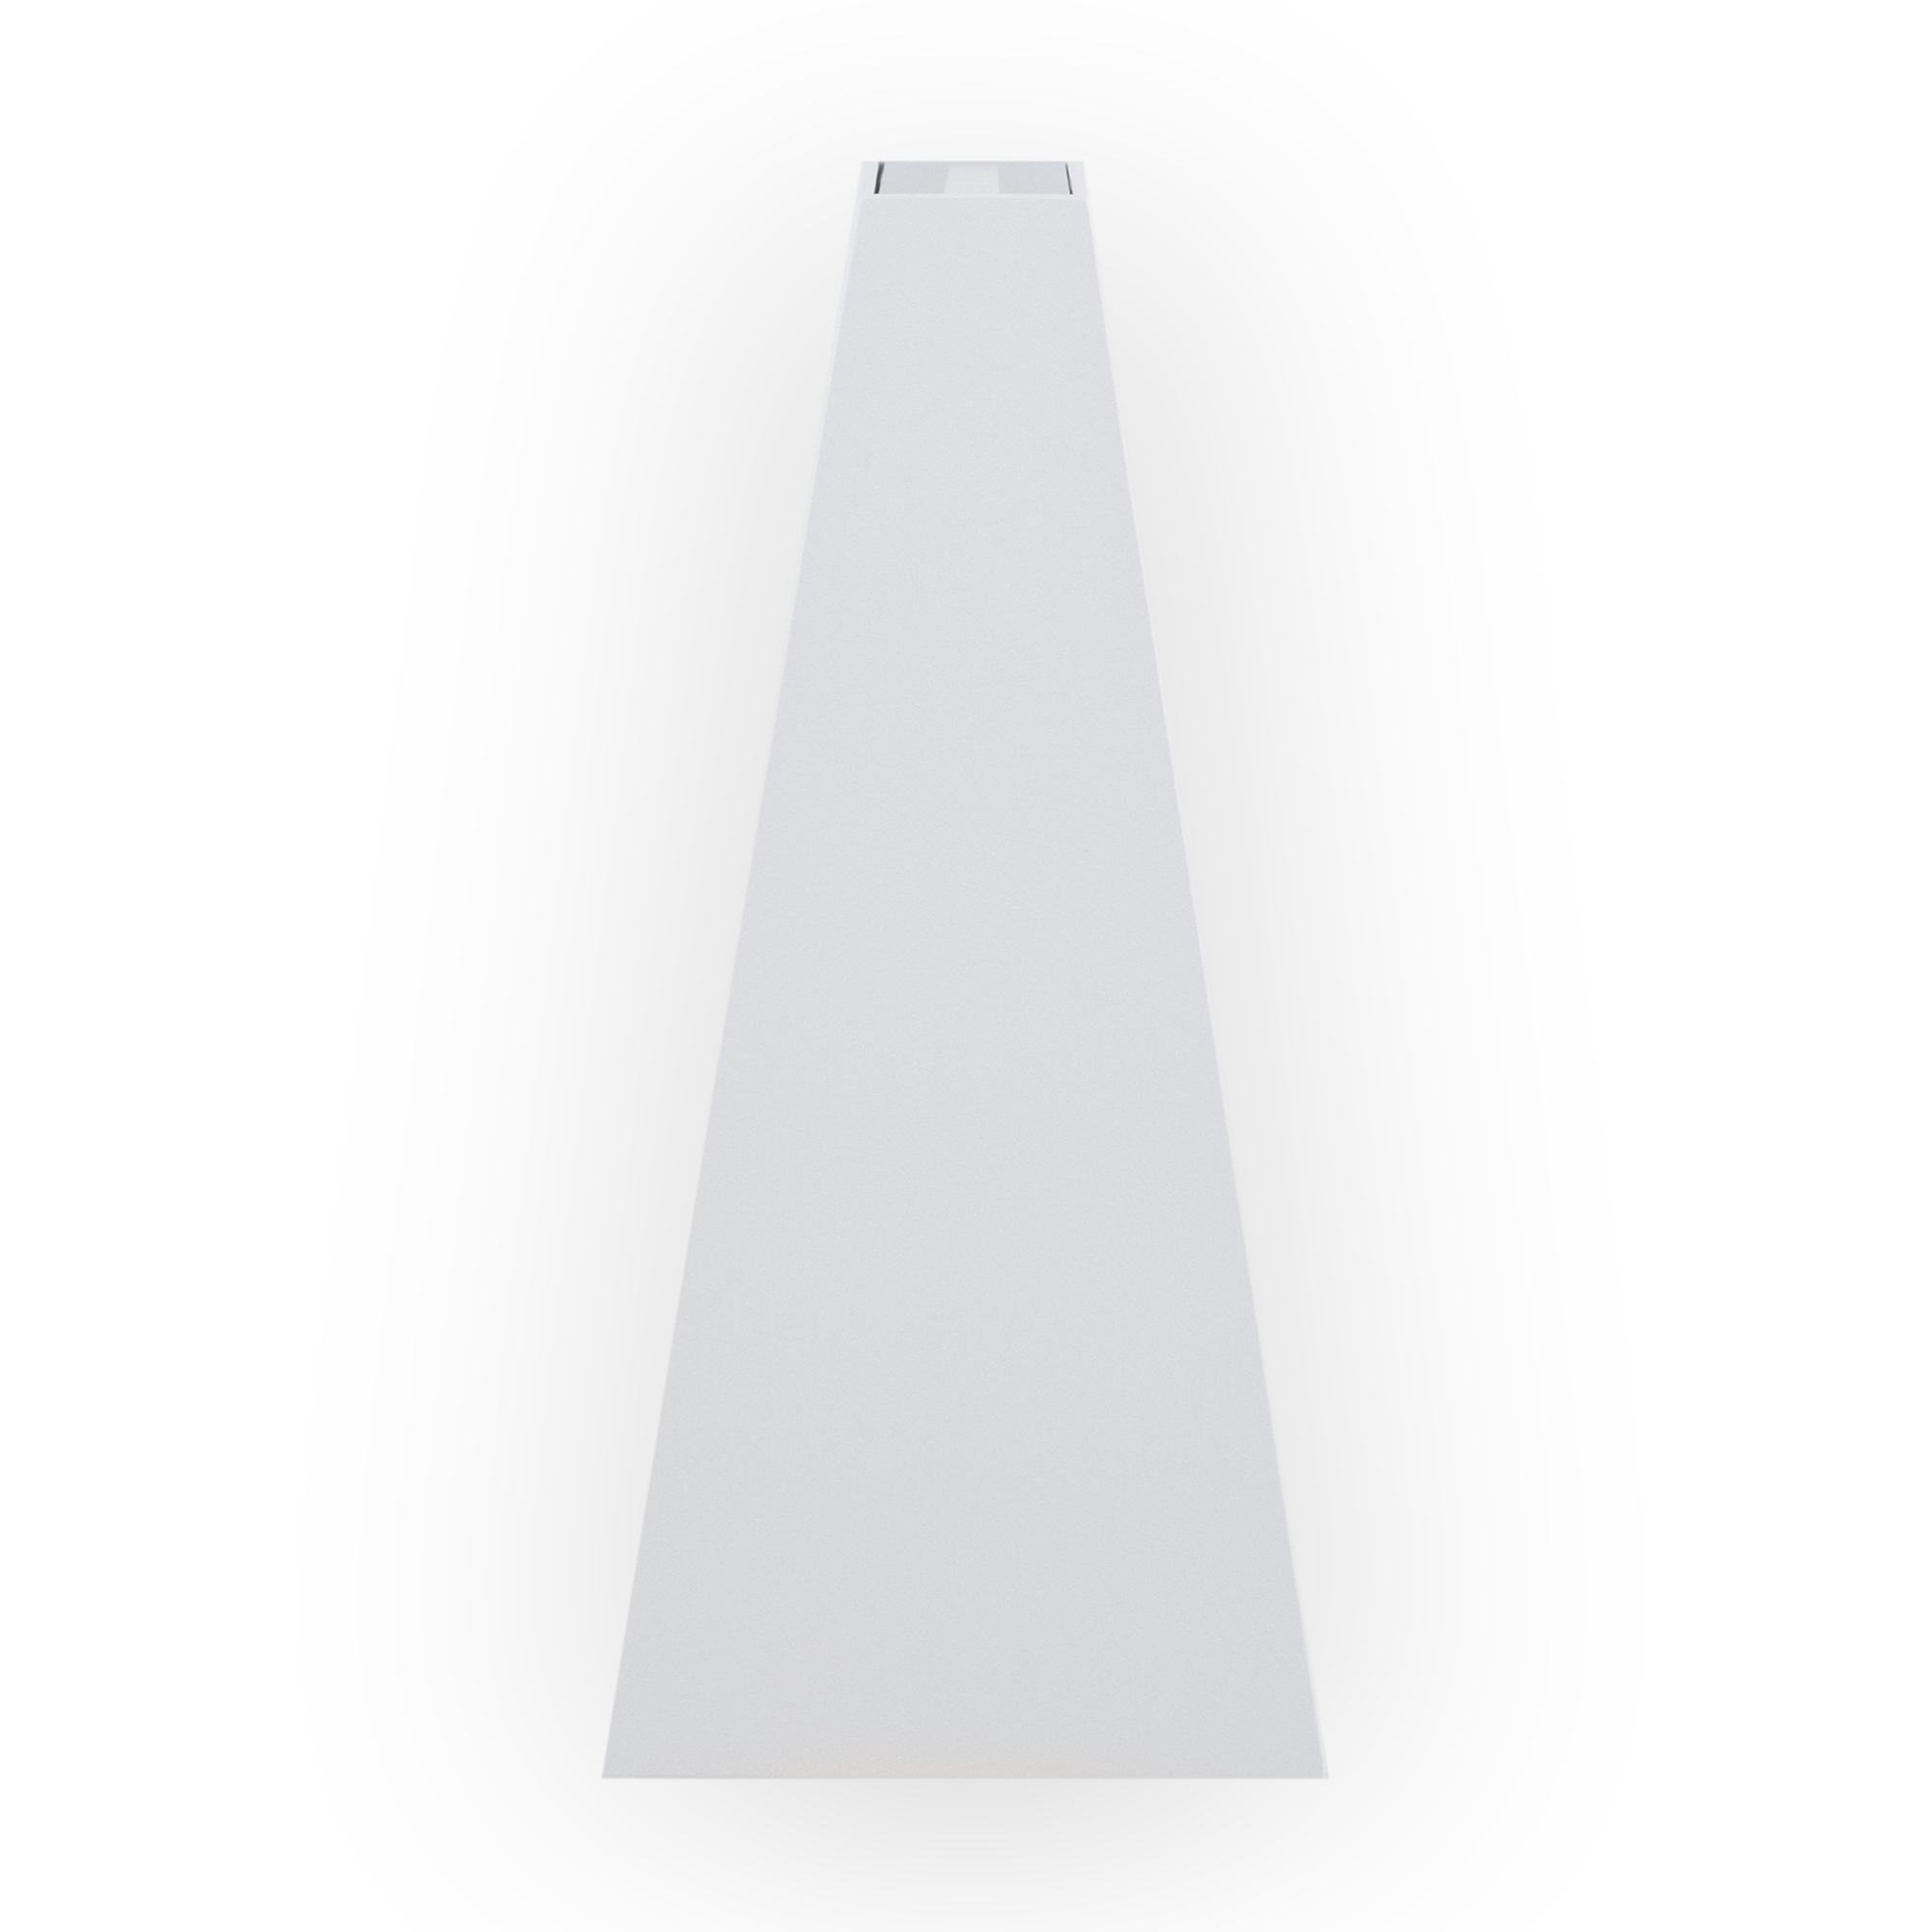 Настенный светодиодный светильник Maytoni Times Square O580WL-L6W, IP54, LED 6W 3000K 380lm CRI80, белый, металл - фото 2